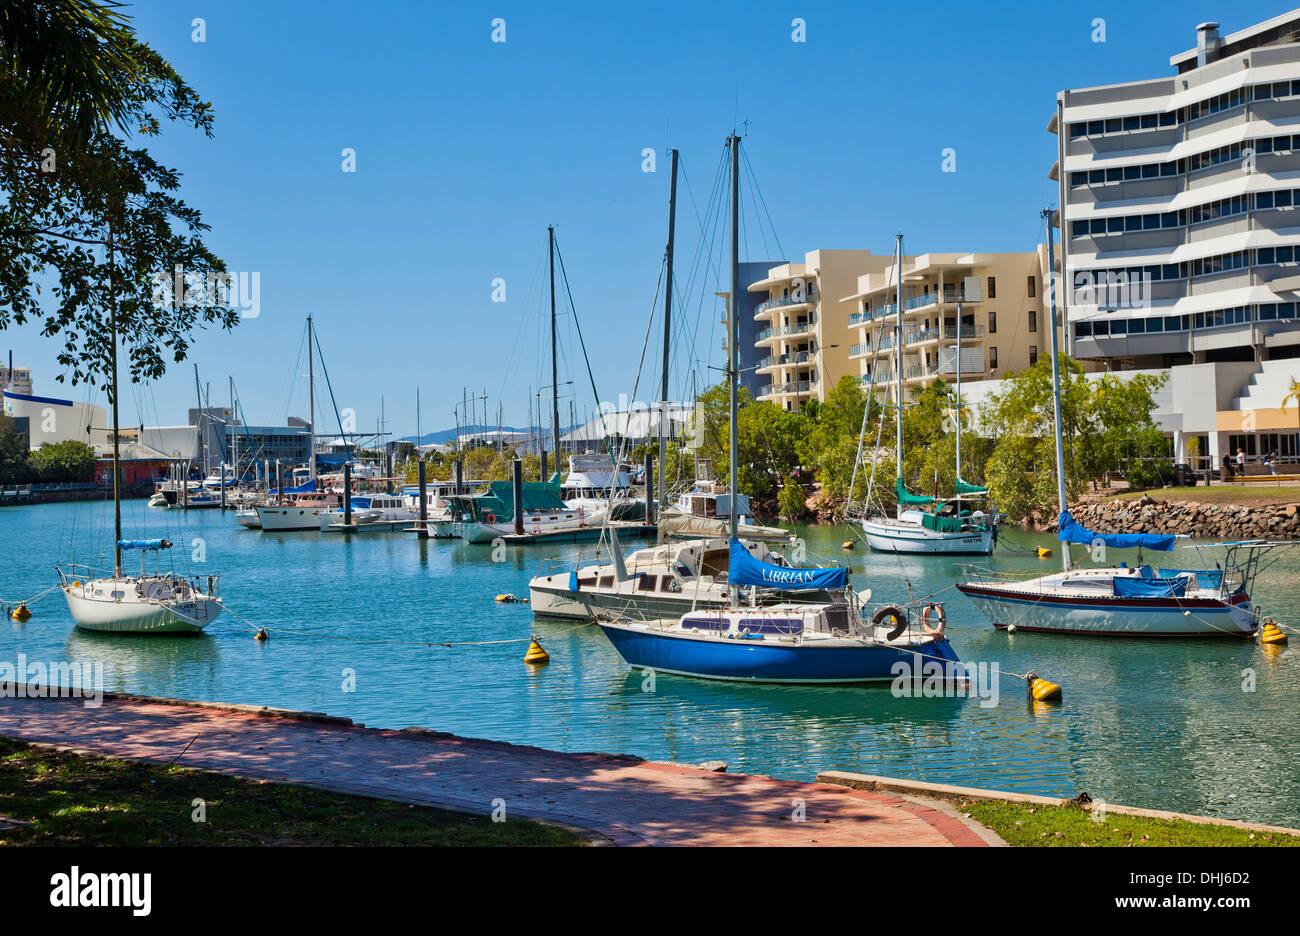 Australia, Queensland, Townsville, yachts moored in Ross Creek - Stock Image